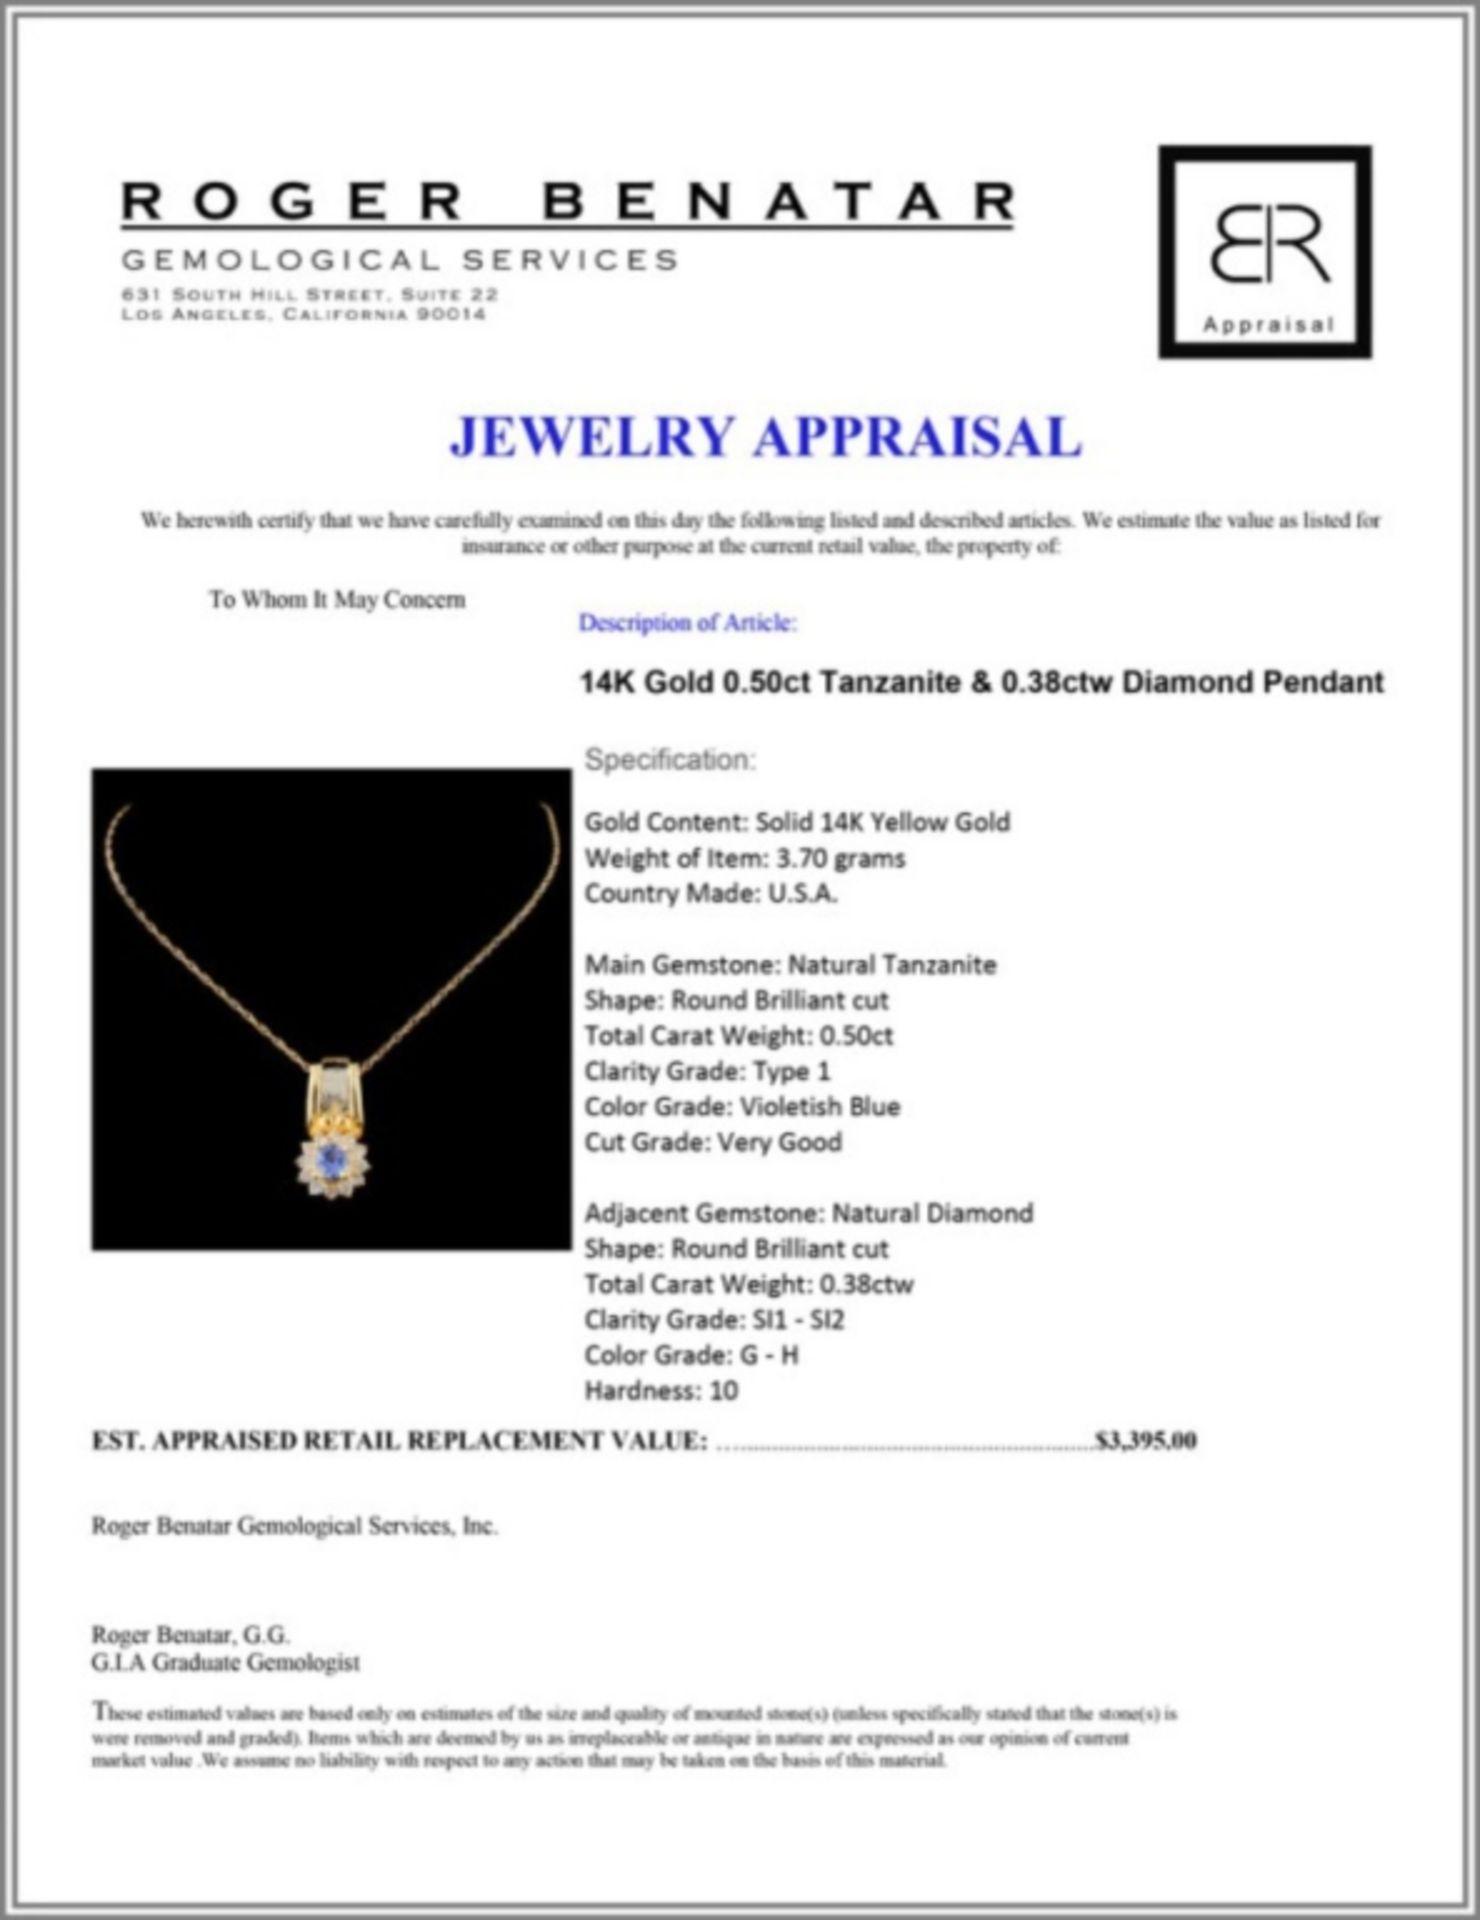 14K Gold 0.50ct Tanzanite & 0.38ctw Diamond Pendan - Image 3 of 3